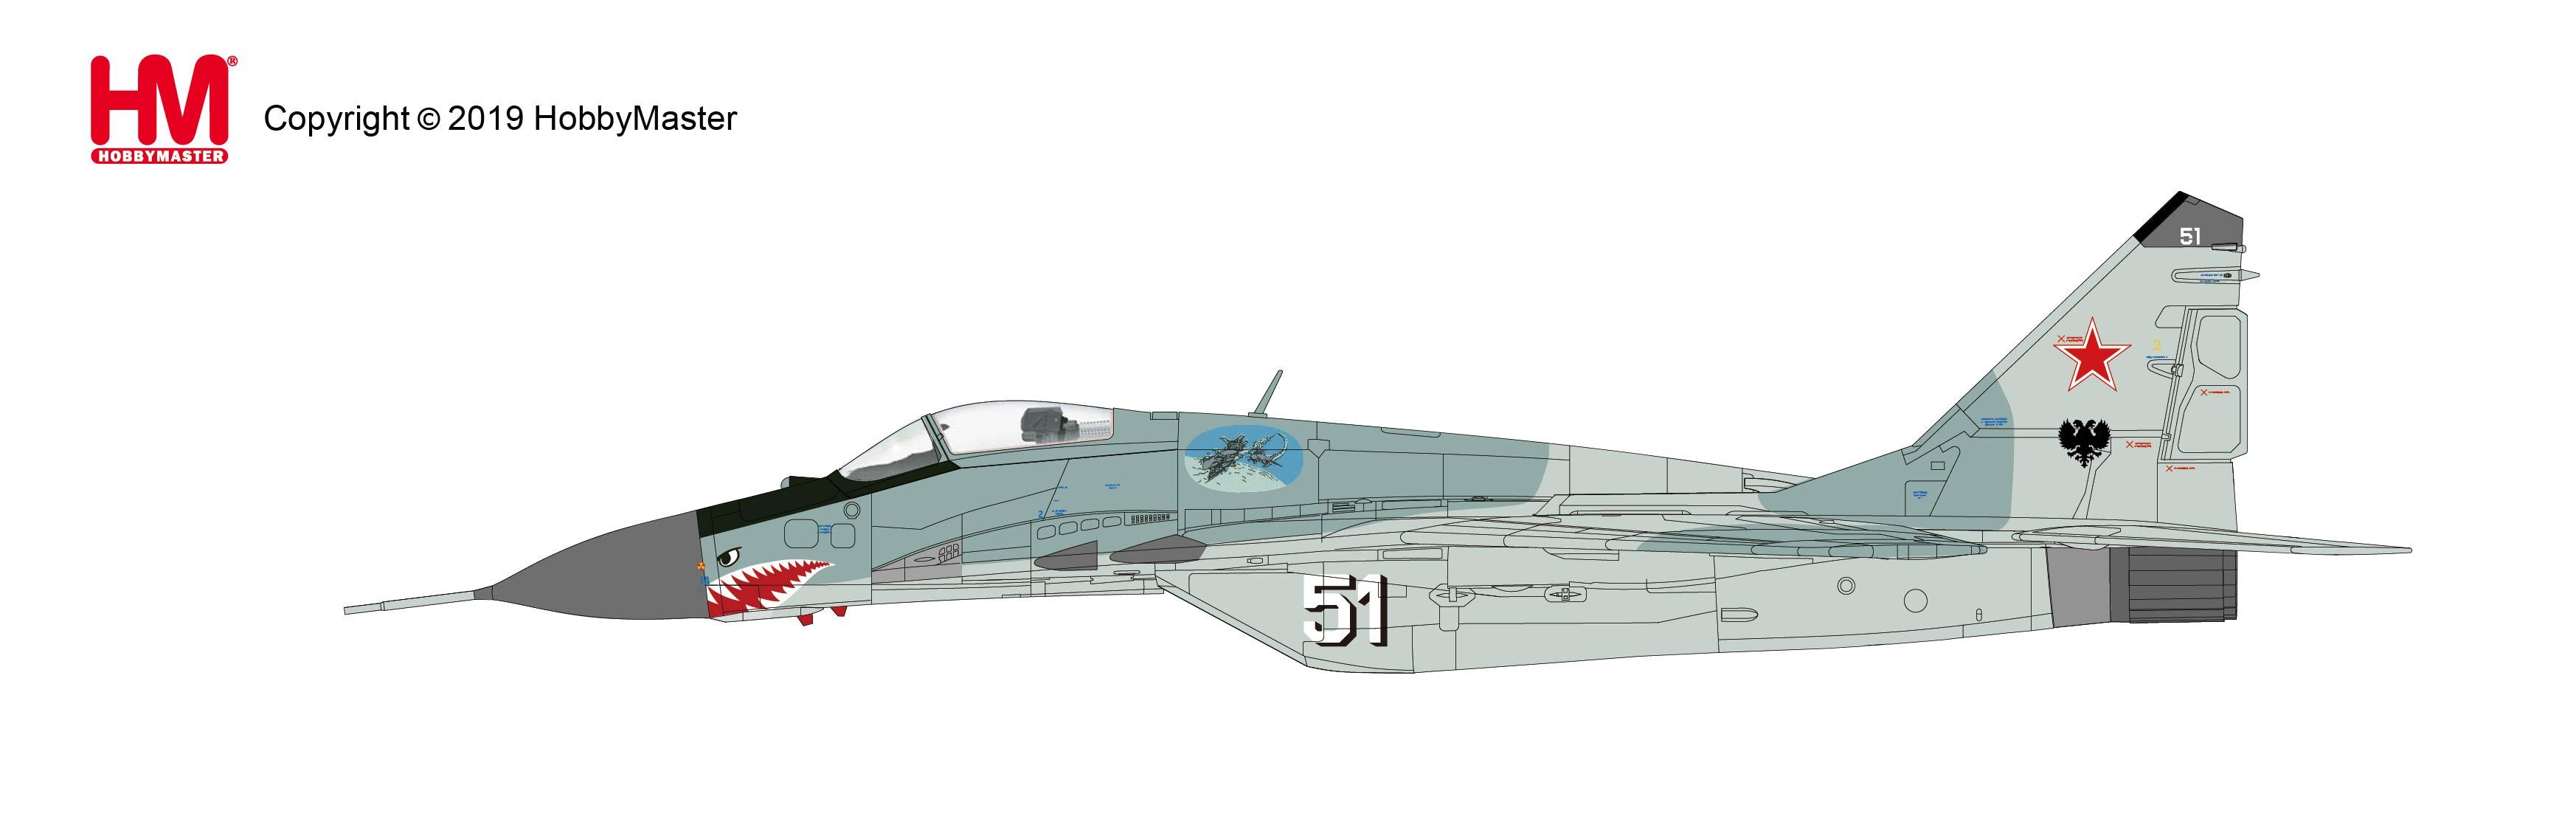 HA6501-1-01